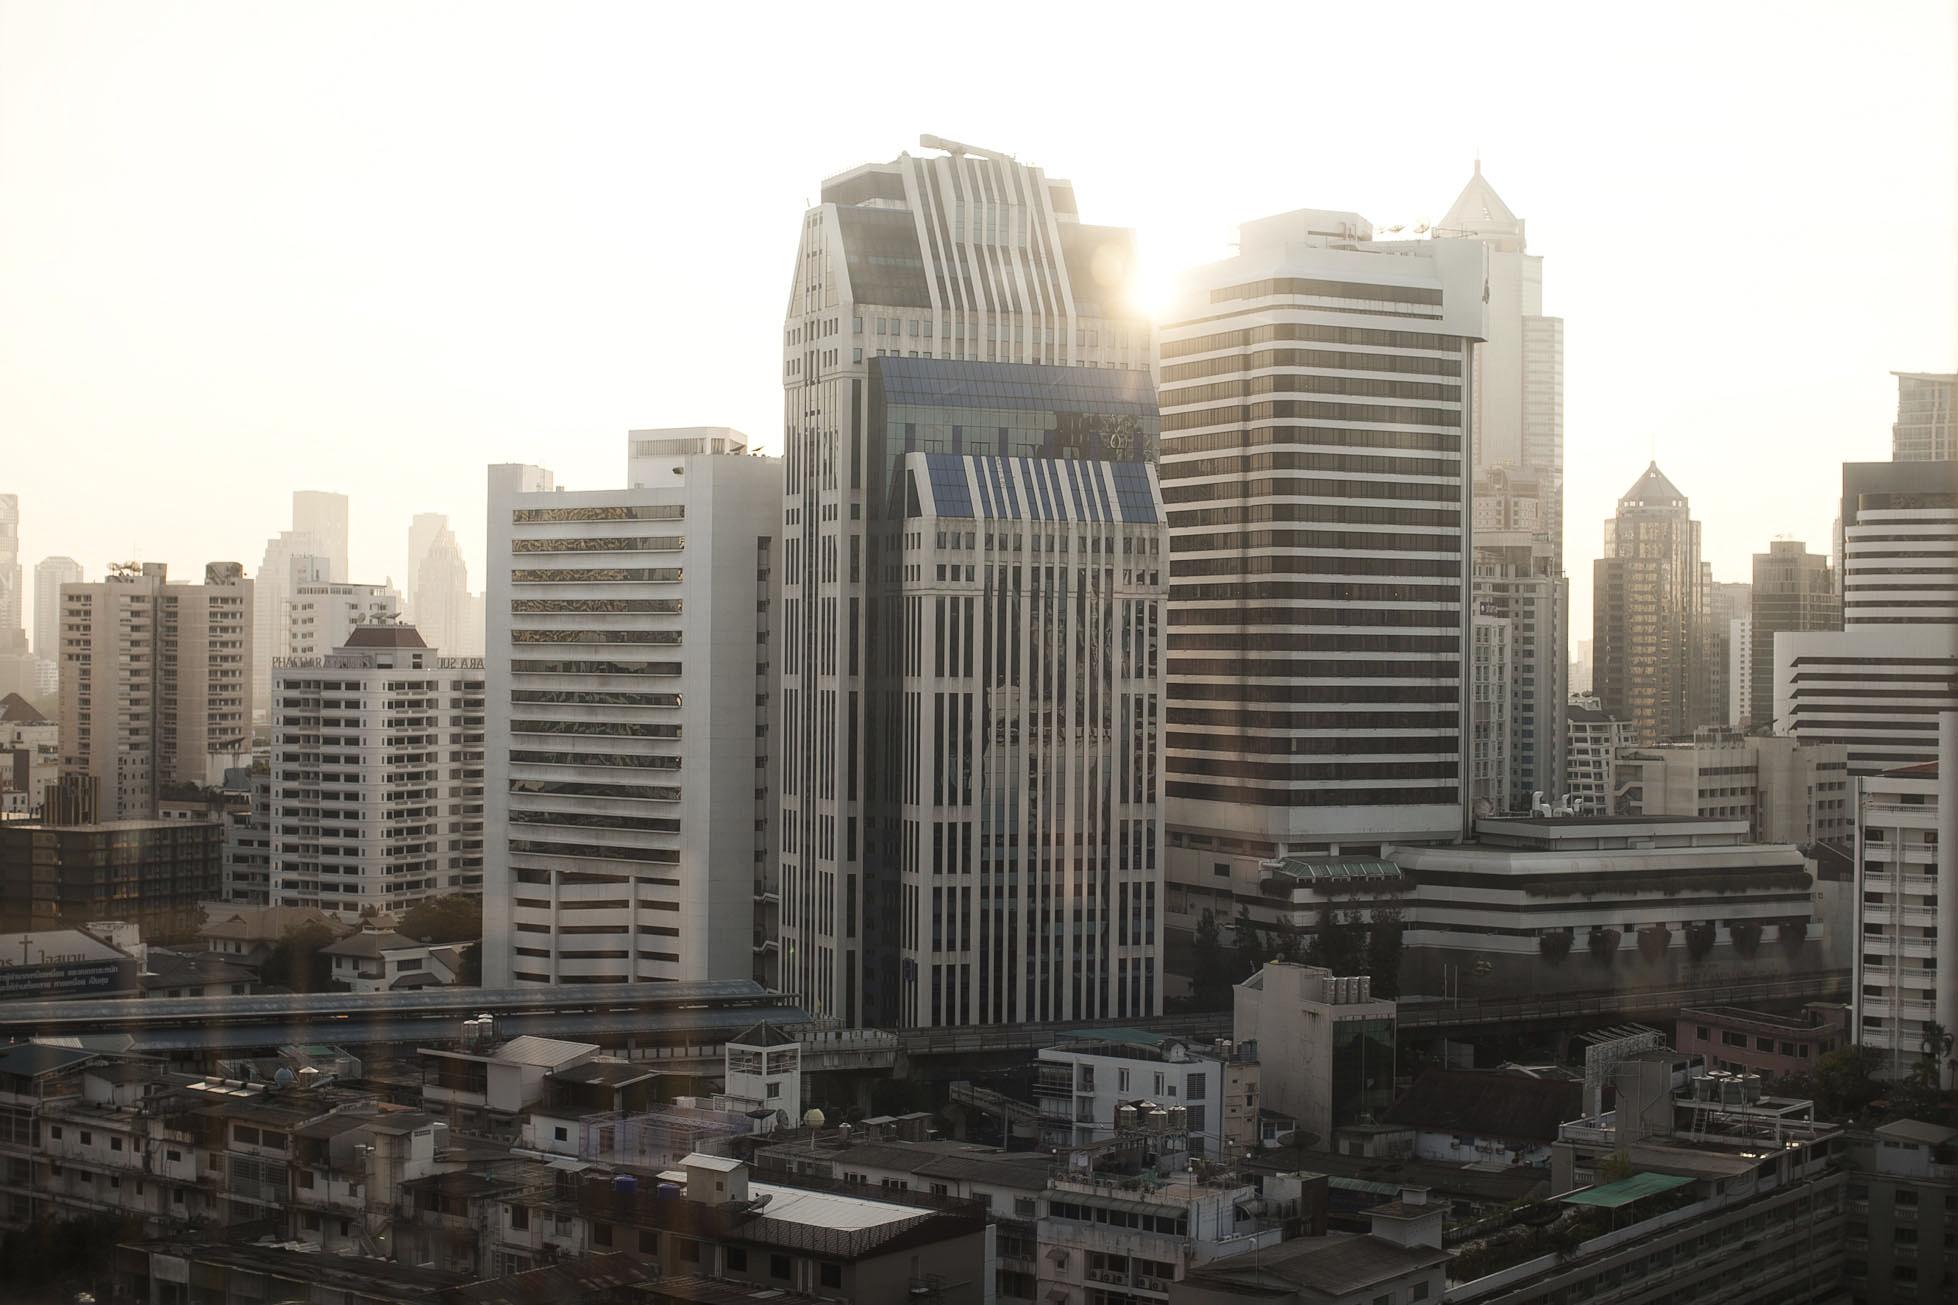 Bangkok, big city lights